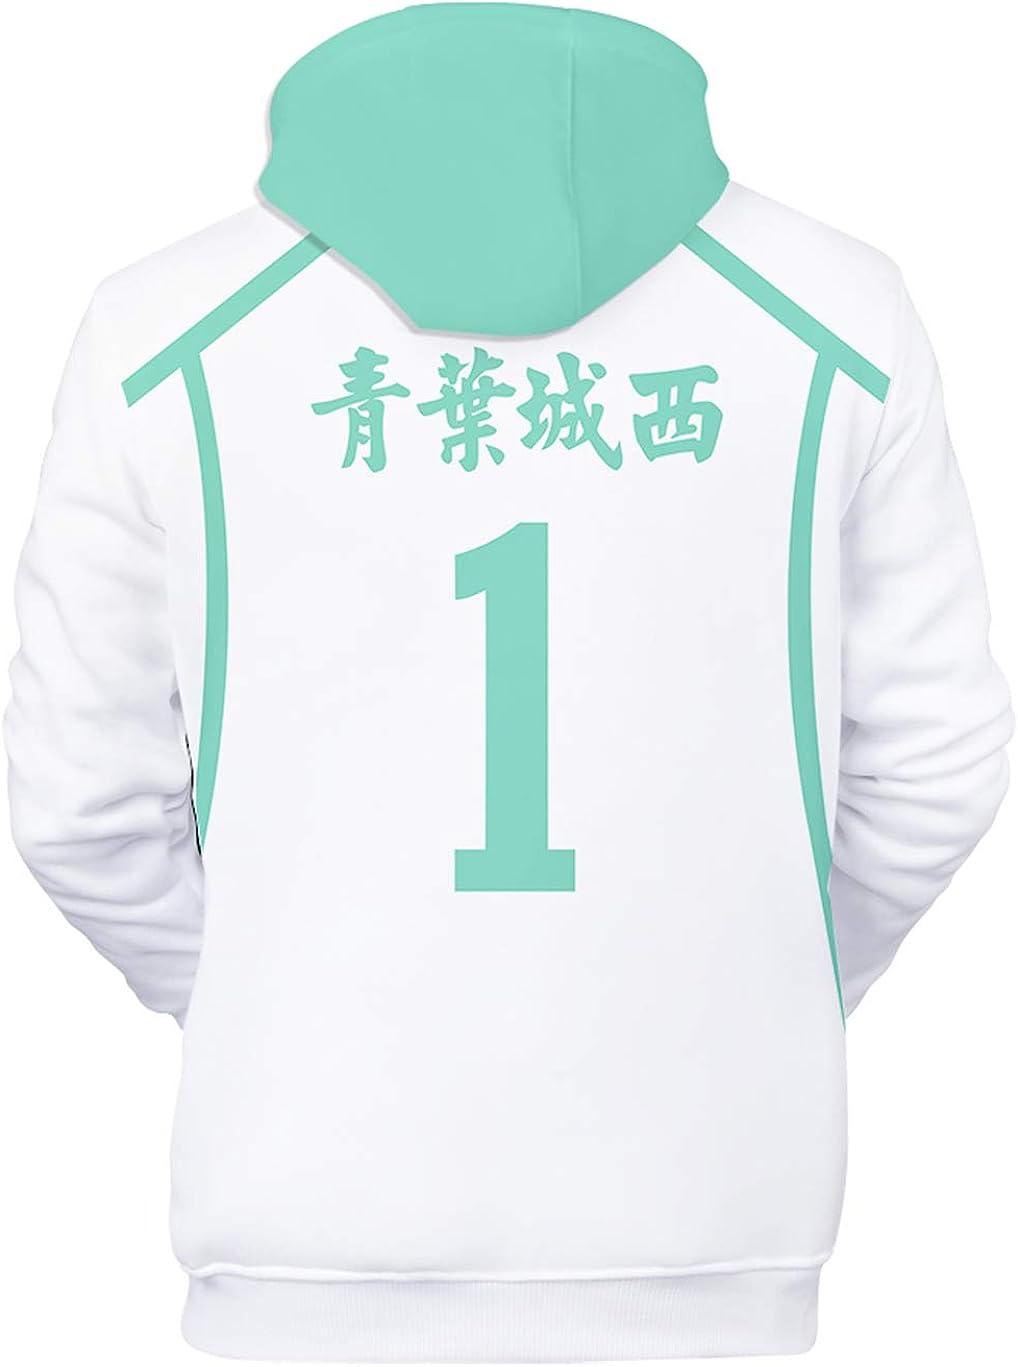 Flyself Unisexe Haikyuu Sweats /à Capuche Hoodie Sweat Cosplay Karasuno High School Volleyball Club Hinata Shyouyou Kageyama Tobio Sportswear Pull Tops